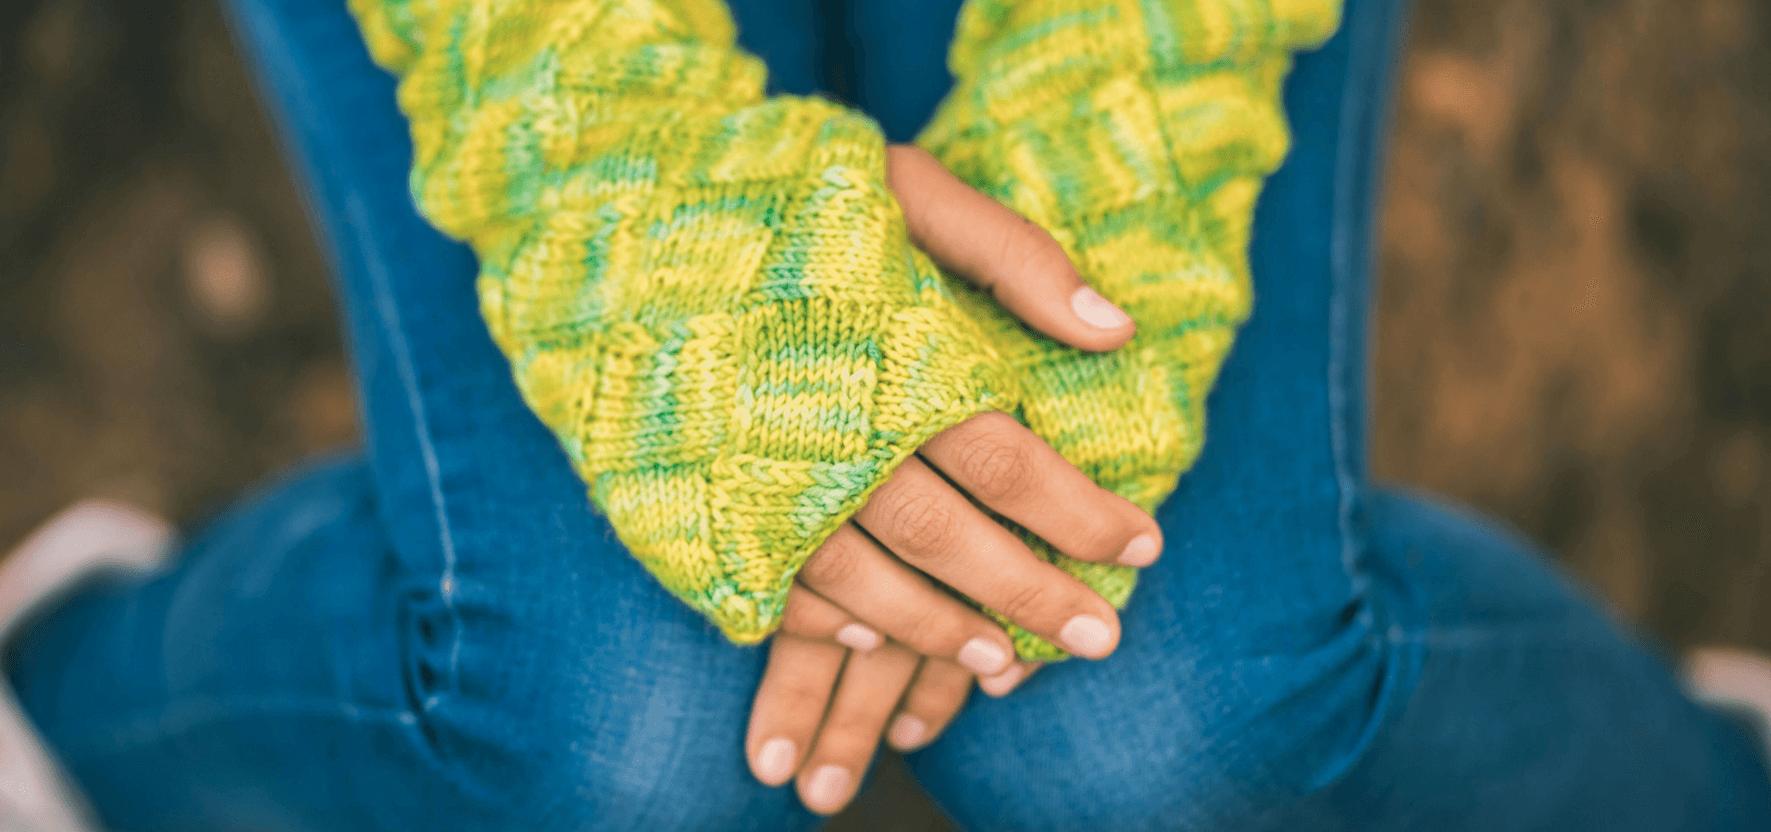 Rosarios4   tricot, crochet, arraiolos e outros têxteis